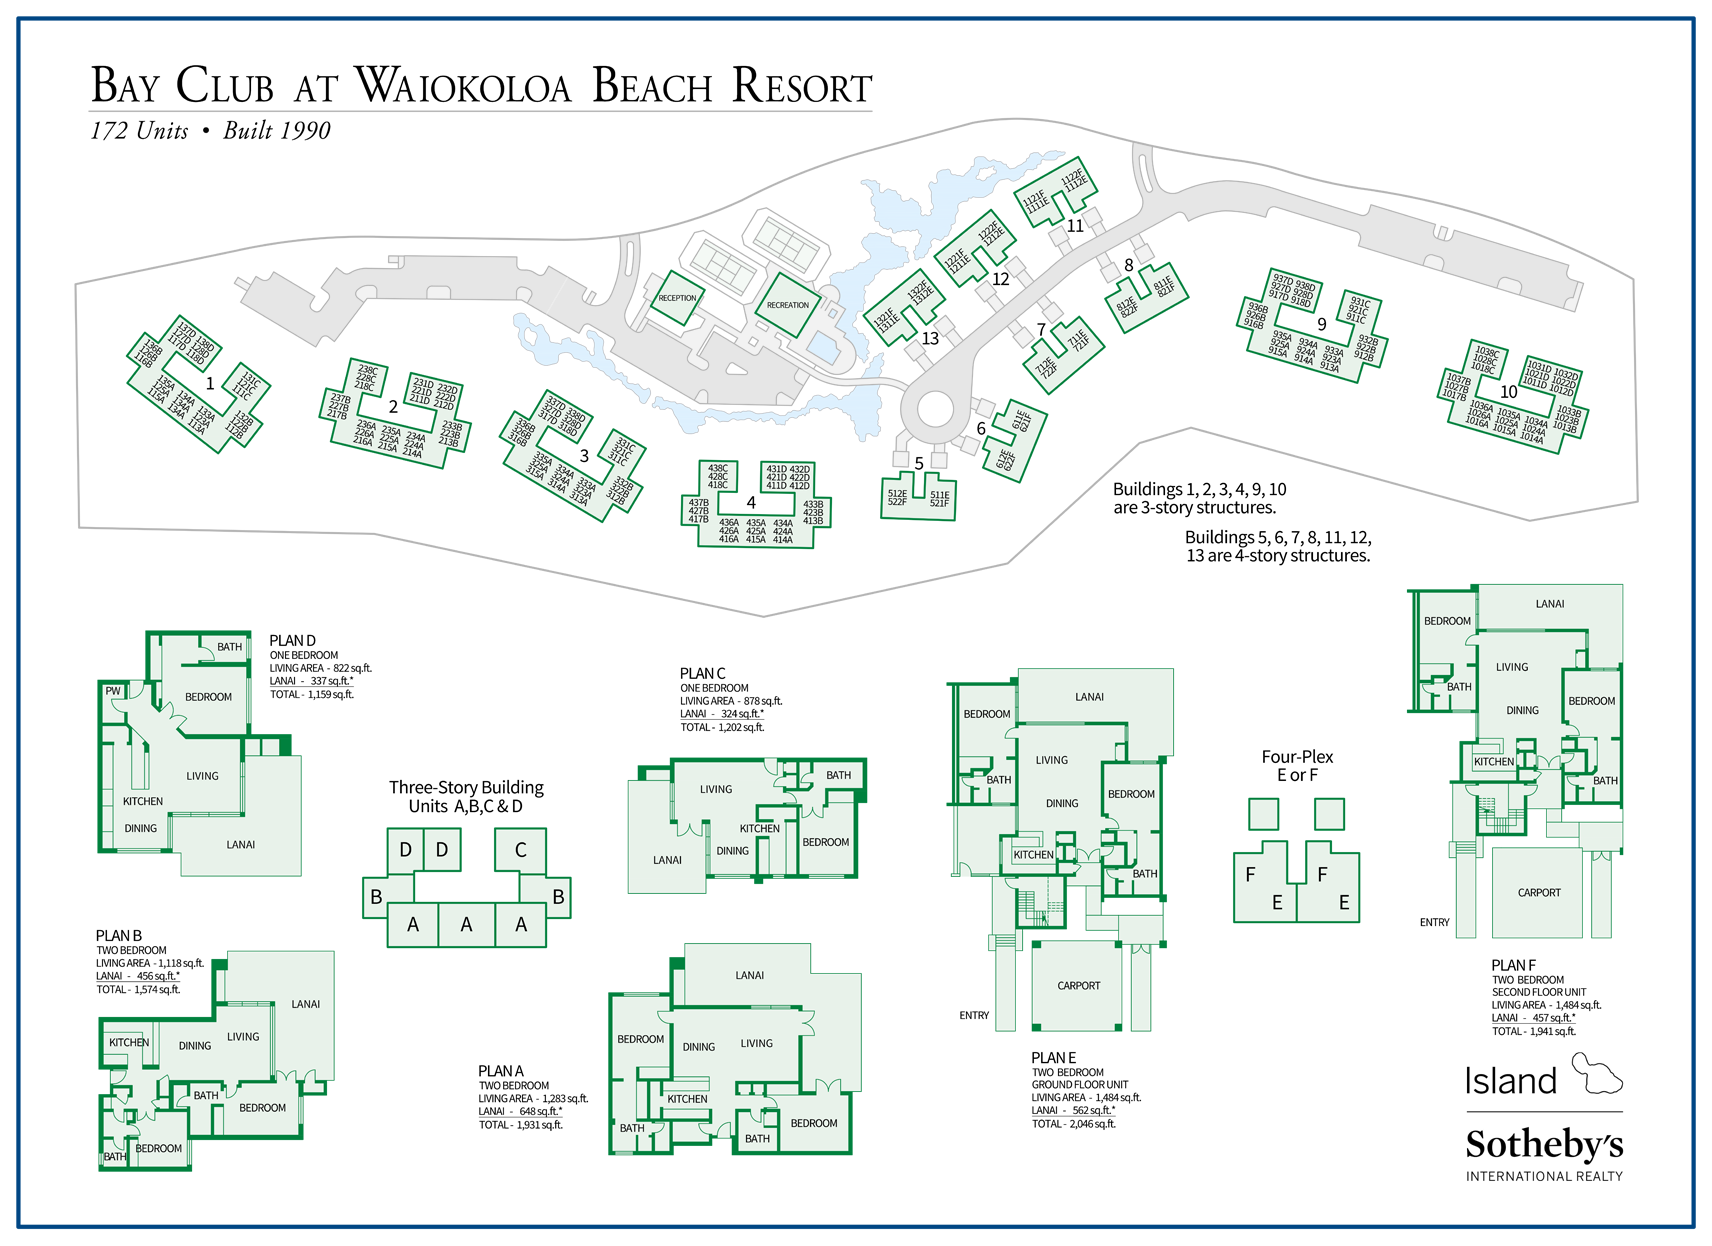 Bay Club at Waiokoloa Beach Resort For Sale | Big Island Kolea Map on wailea beach marriott map, hali'i kai map, fairway villas map, napili point map, halii kai map, hawaii kai map, luana kai map, constantine map, grand wailea map, pauoa beach map, oran map,